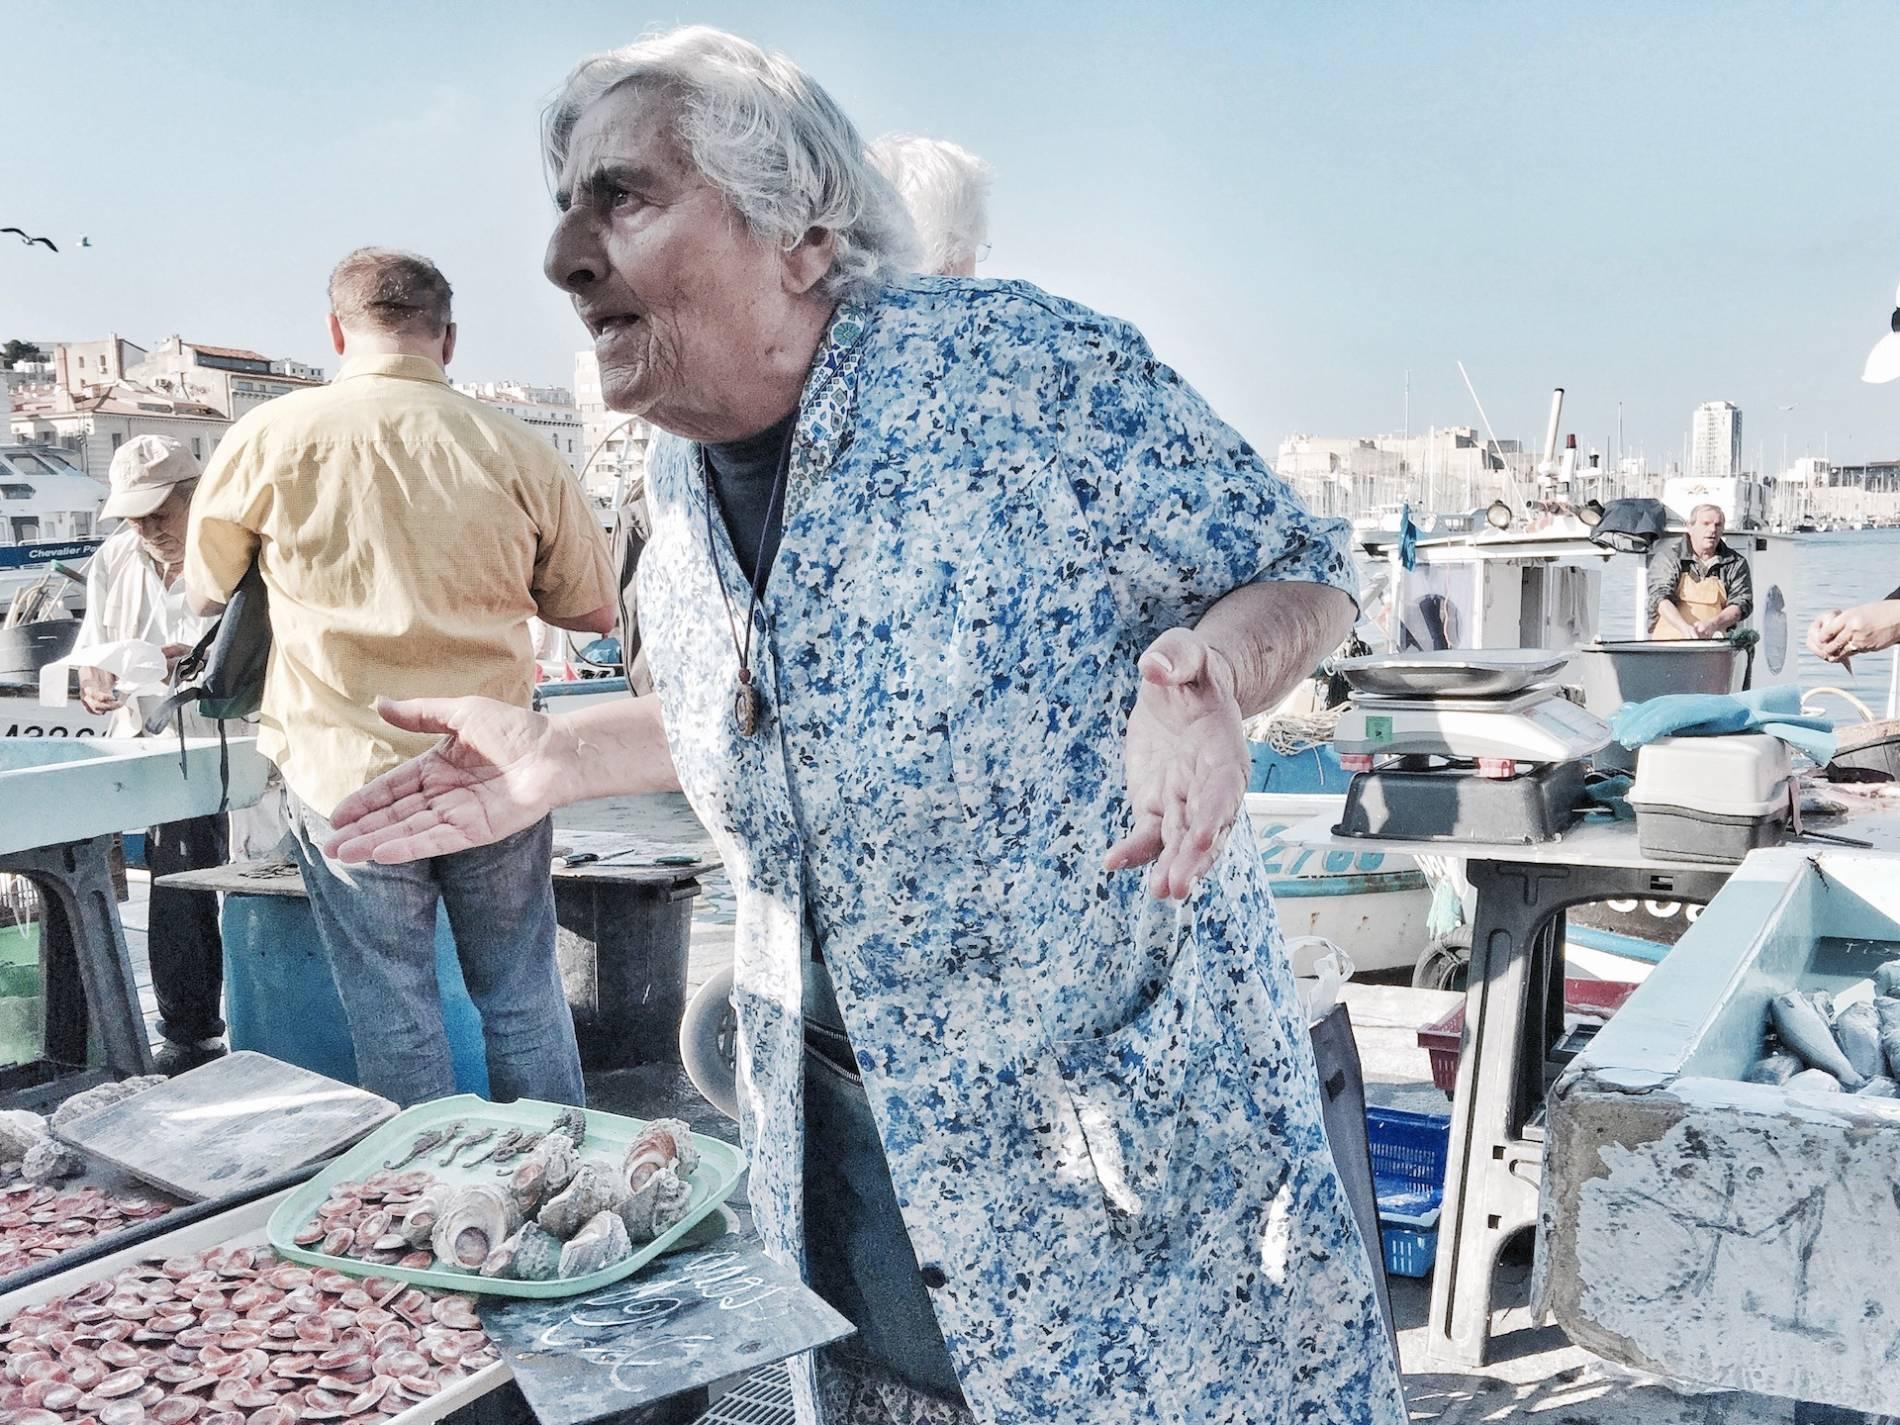 marseille-poissonniere-vieux-port